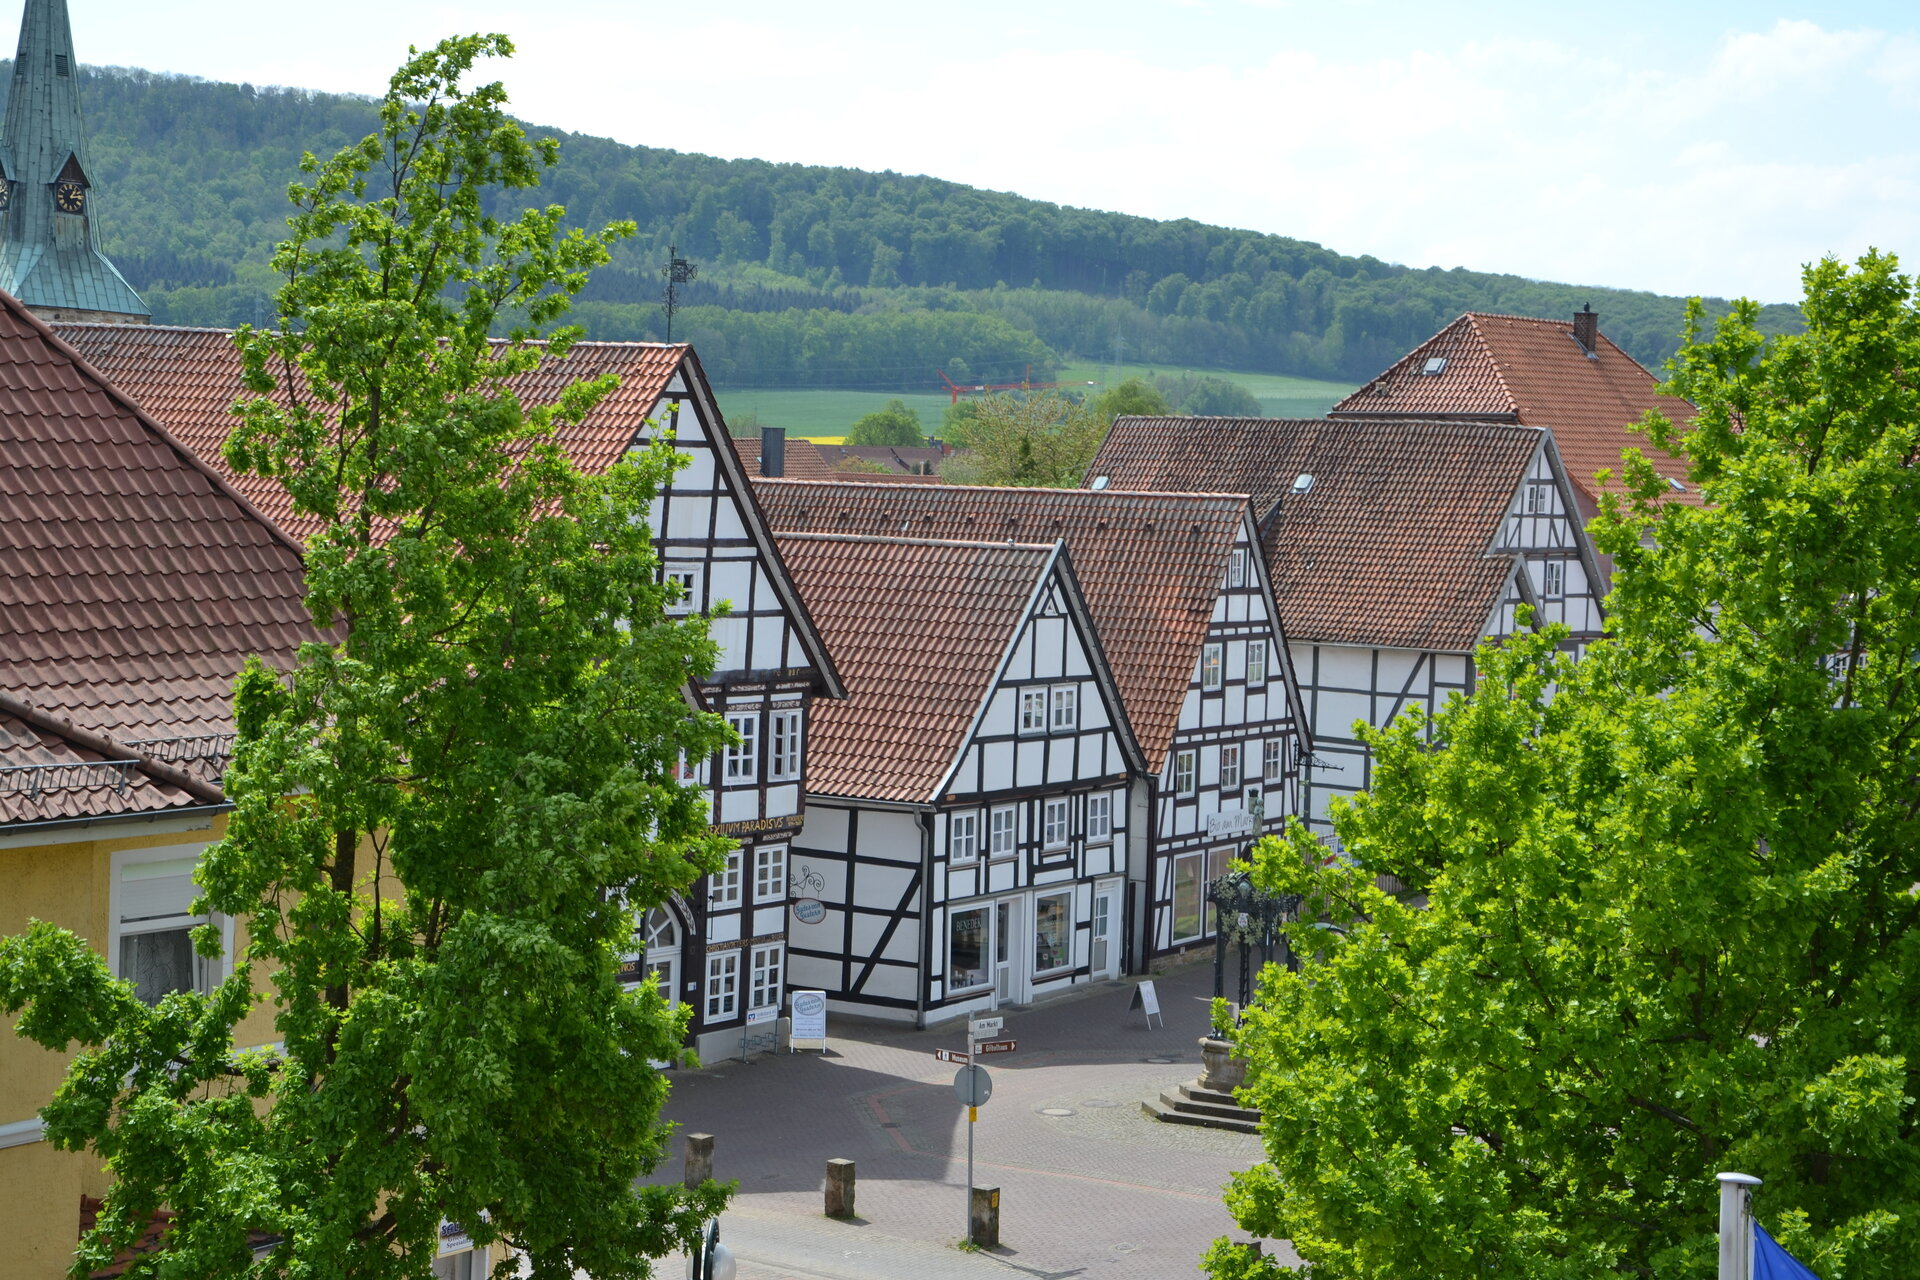 Blick auf die Springer Altstadt